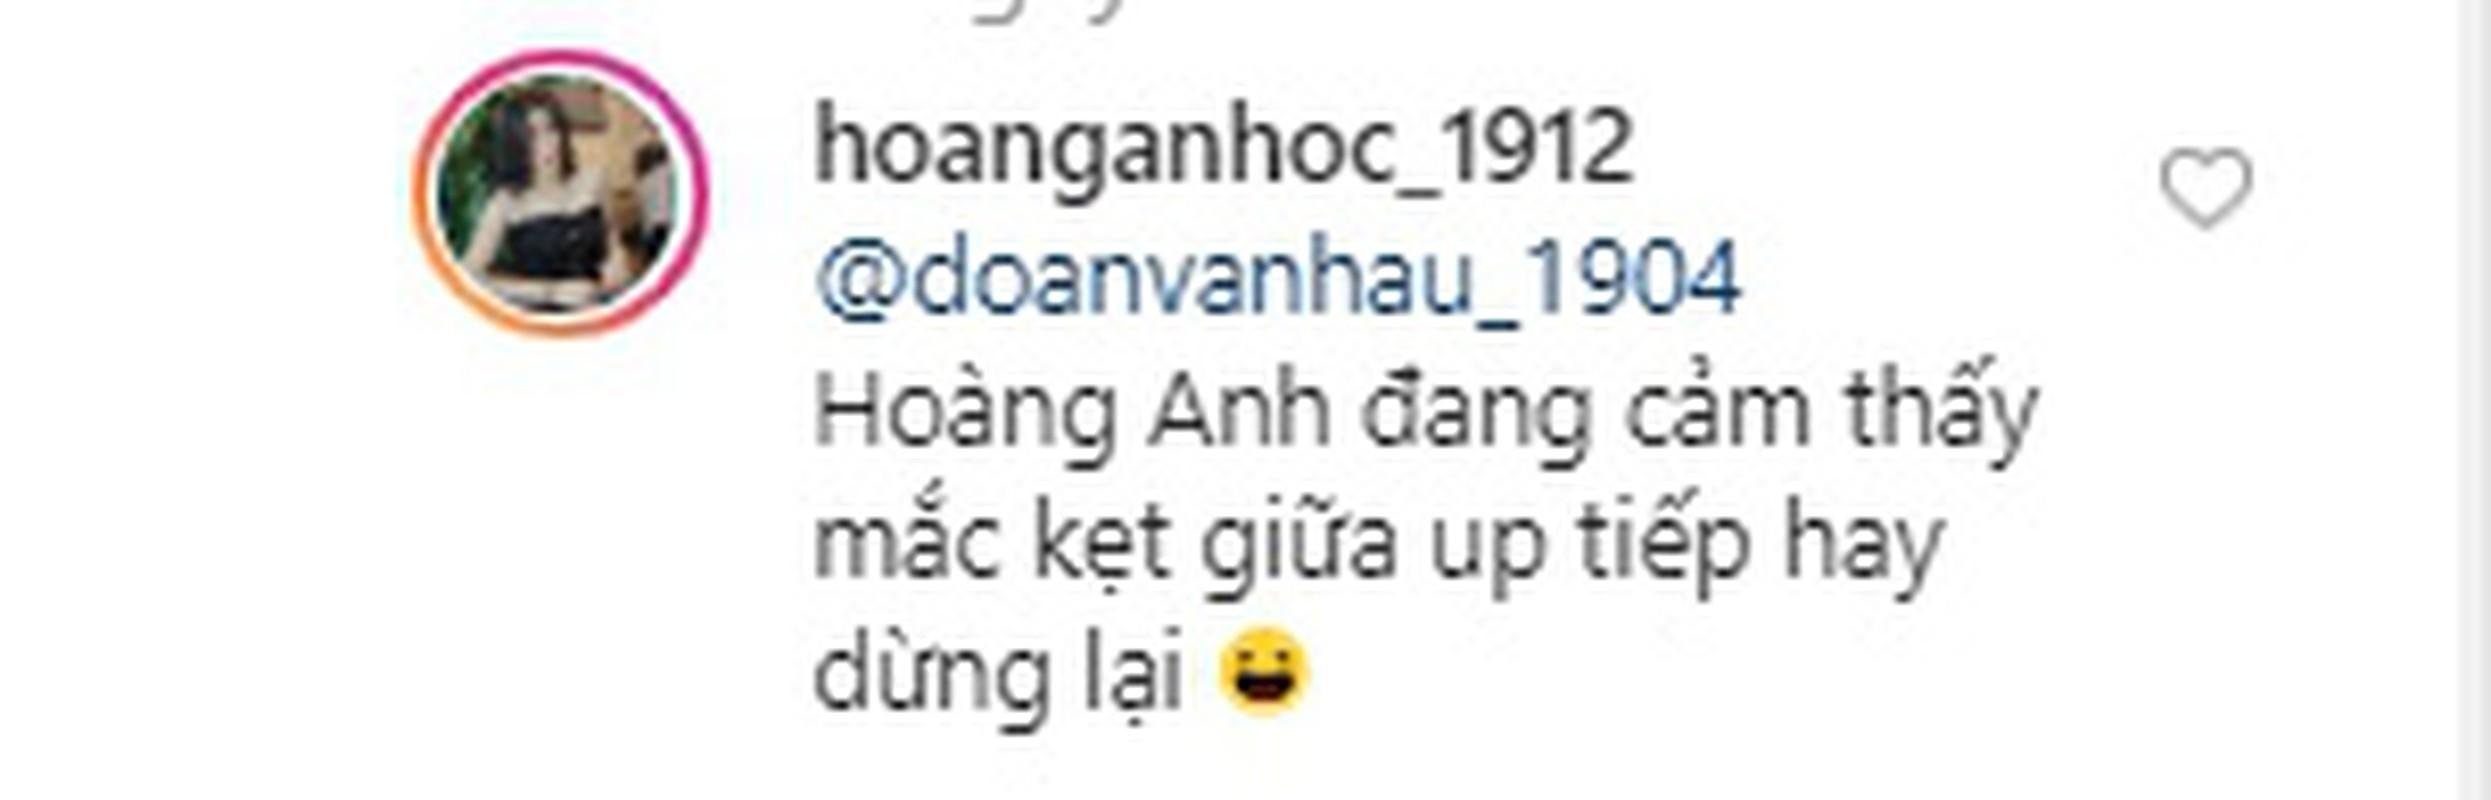 Dang du SEA Games, Van Hau len mang xa hoi than phien ve ban gai hot girl-Hinh-4